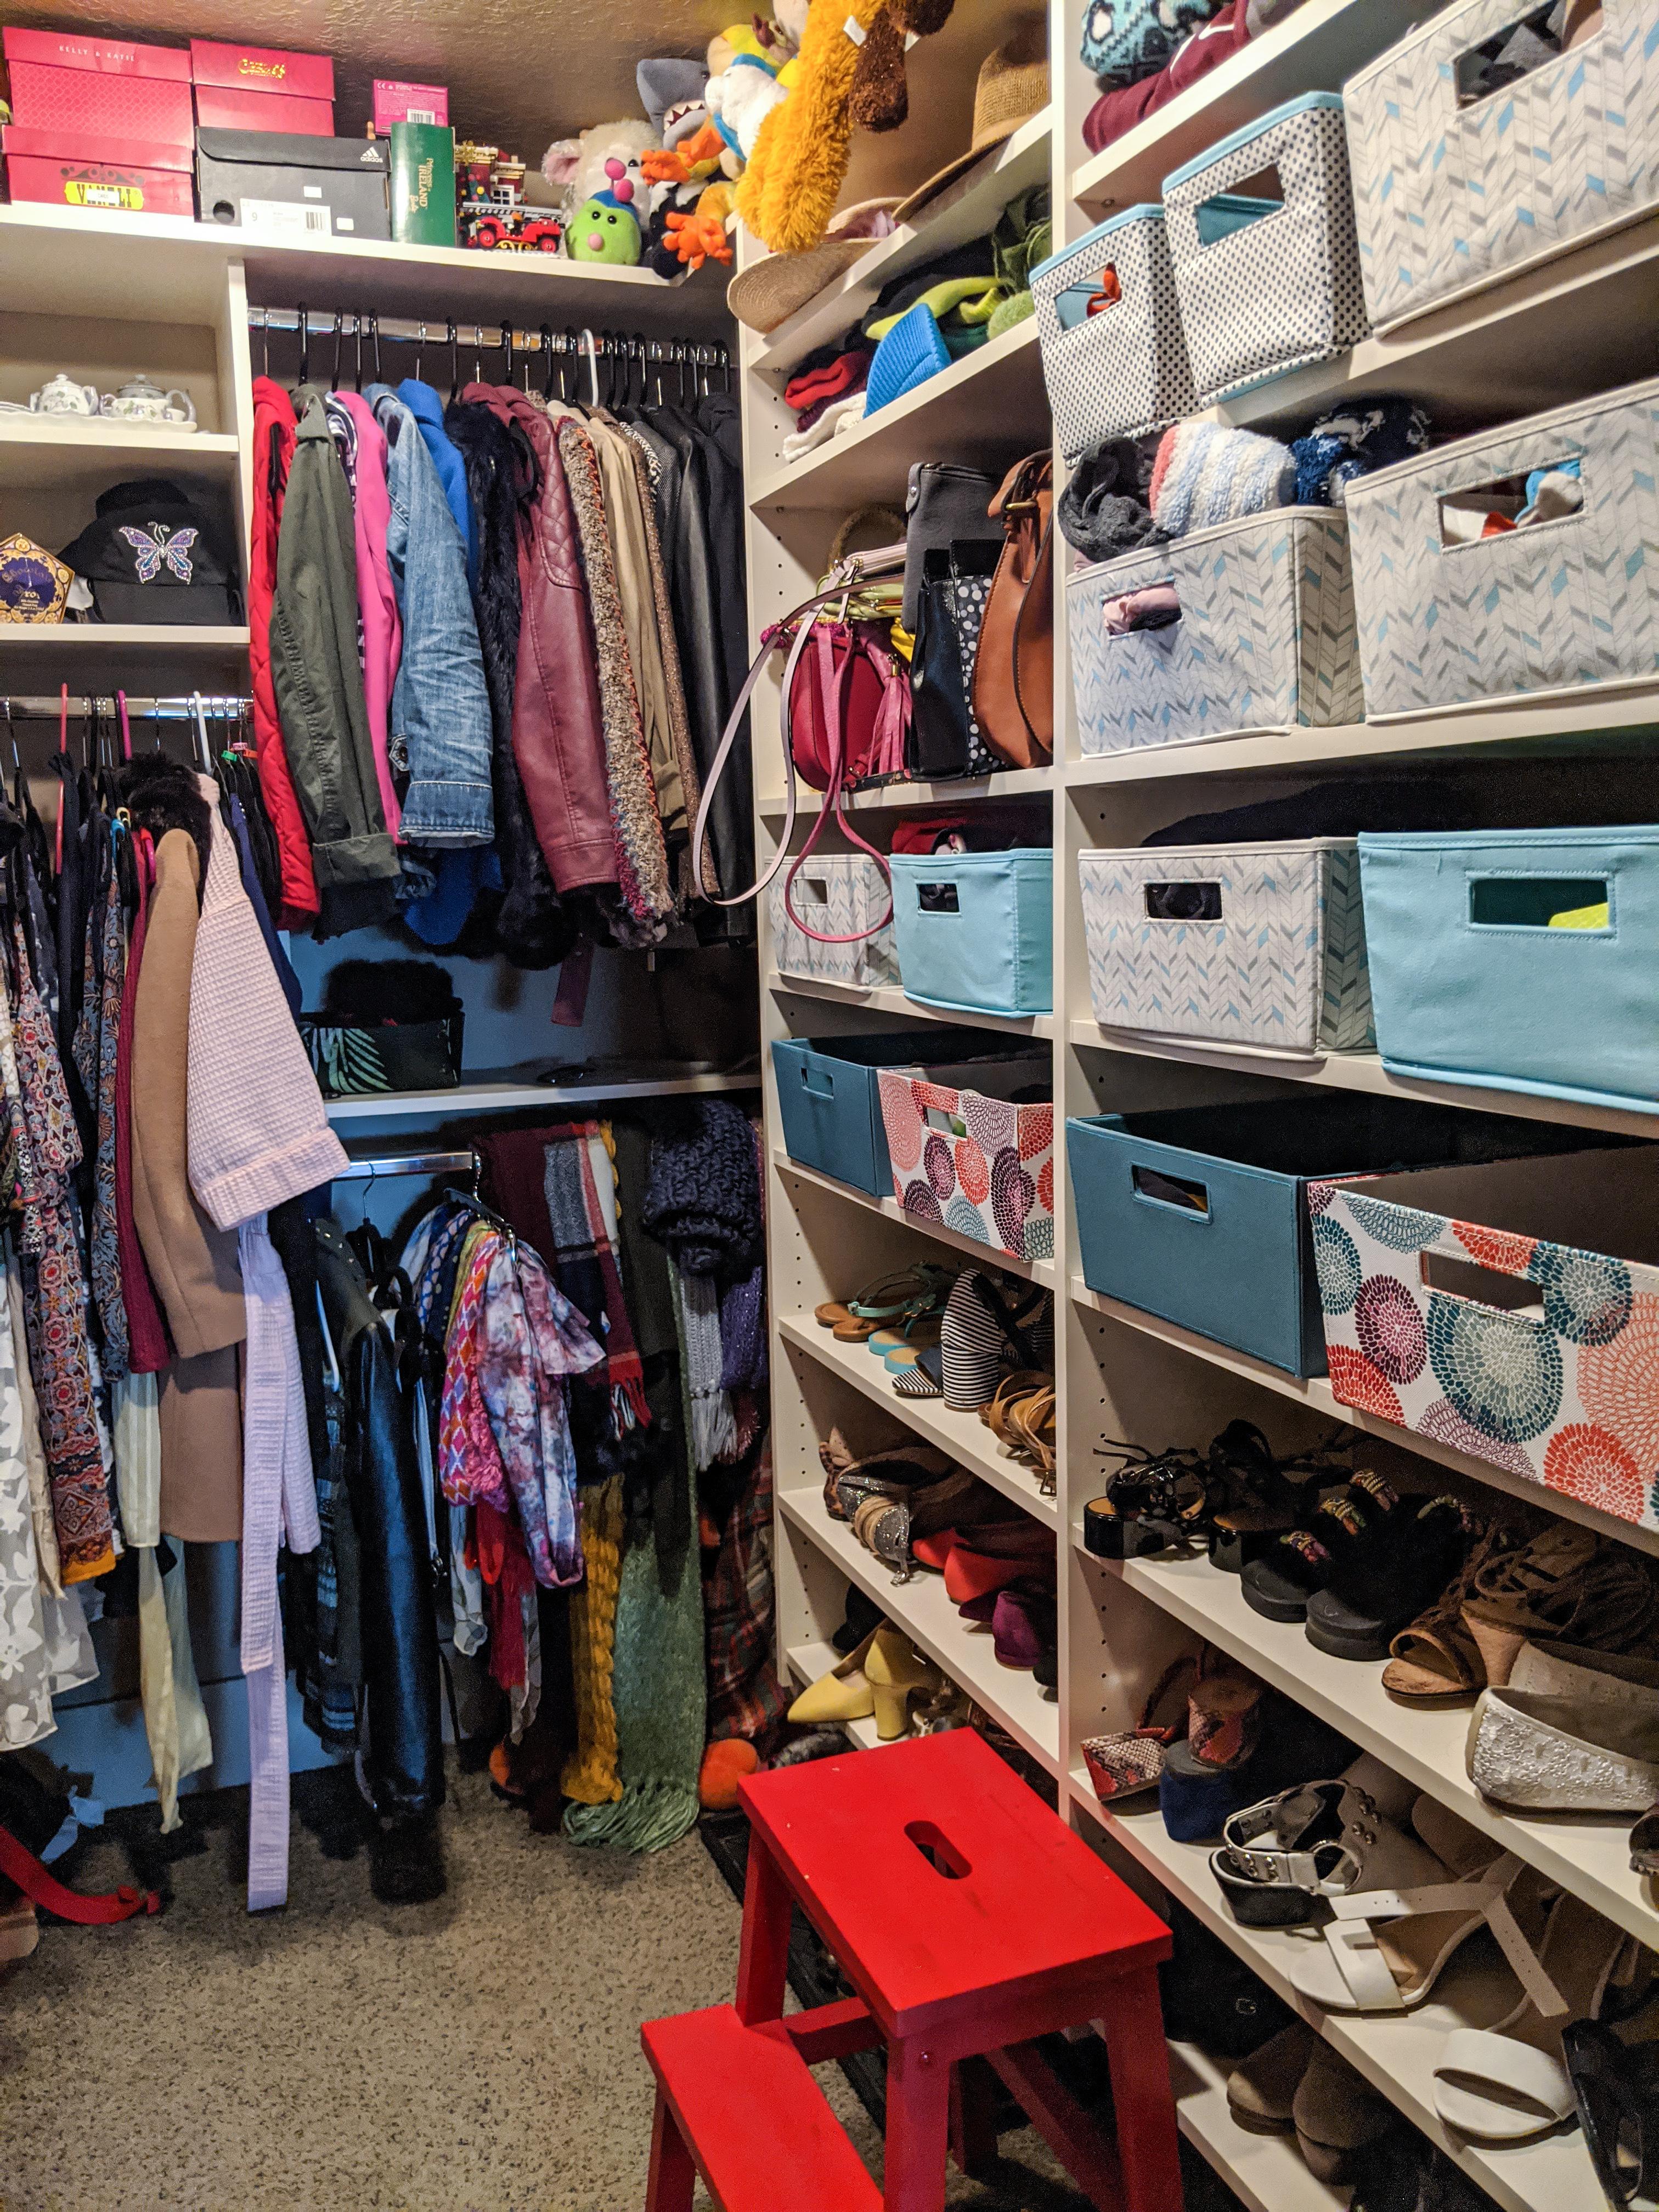 closet-shelves-fabric-bins-shoes